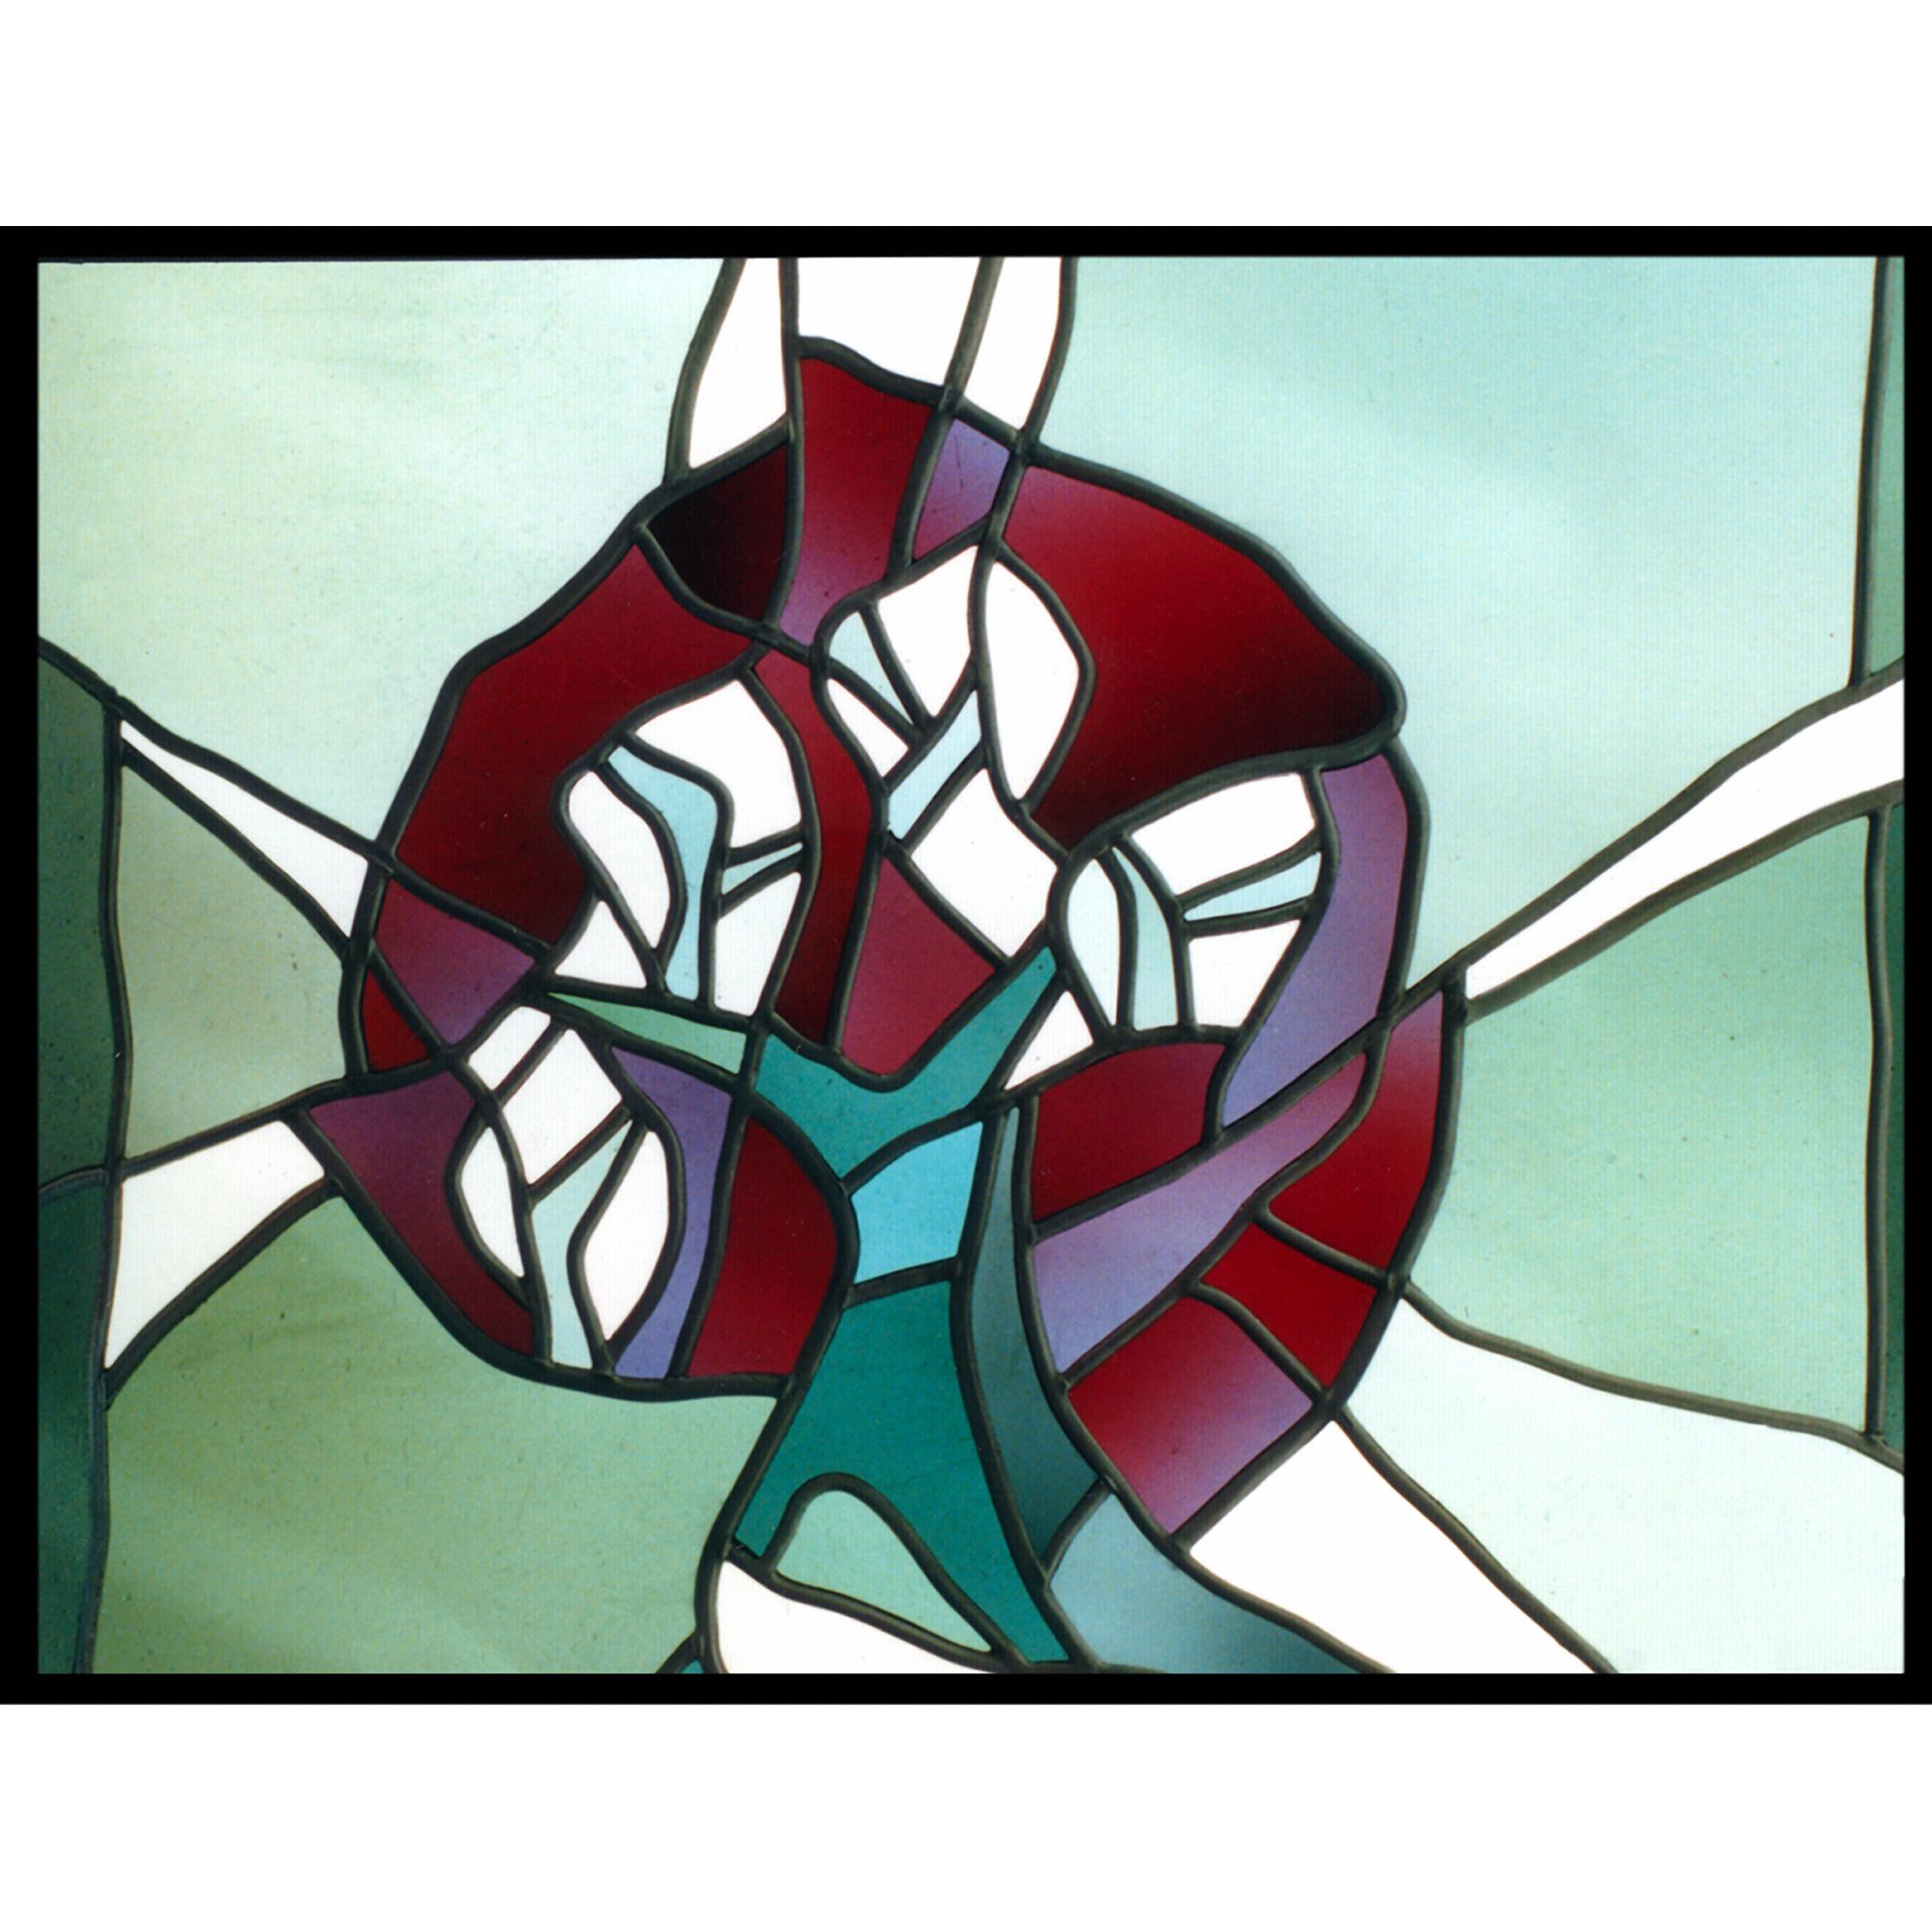 Neubeginn Glaskomposition Baumthema Glas-Design -Glasmalerei-Bleiverglasung